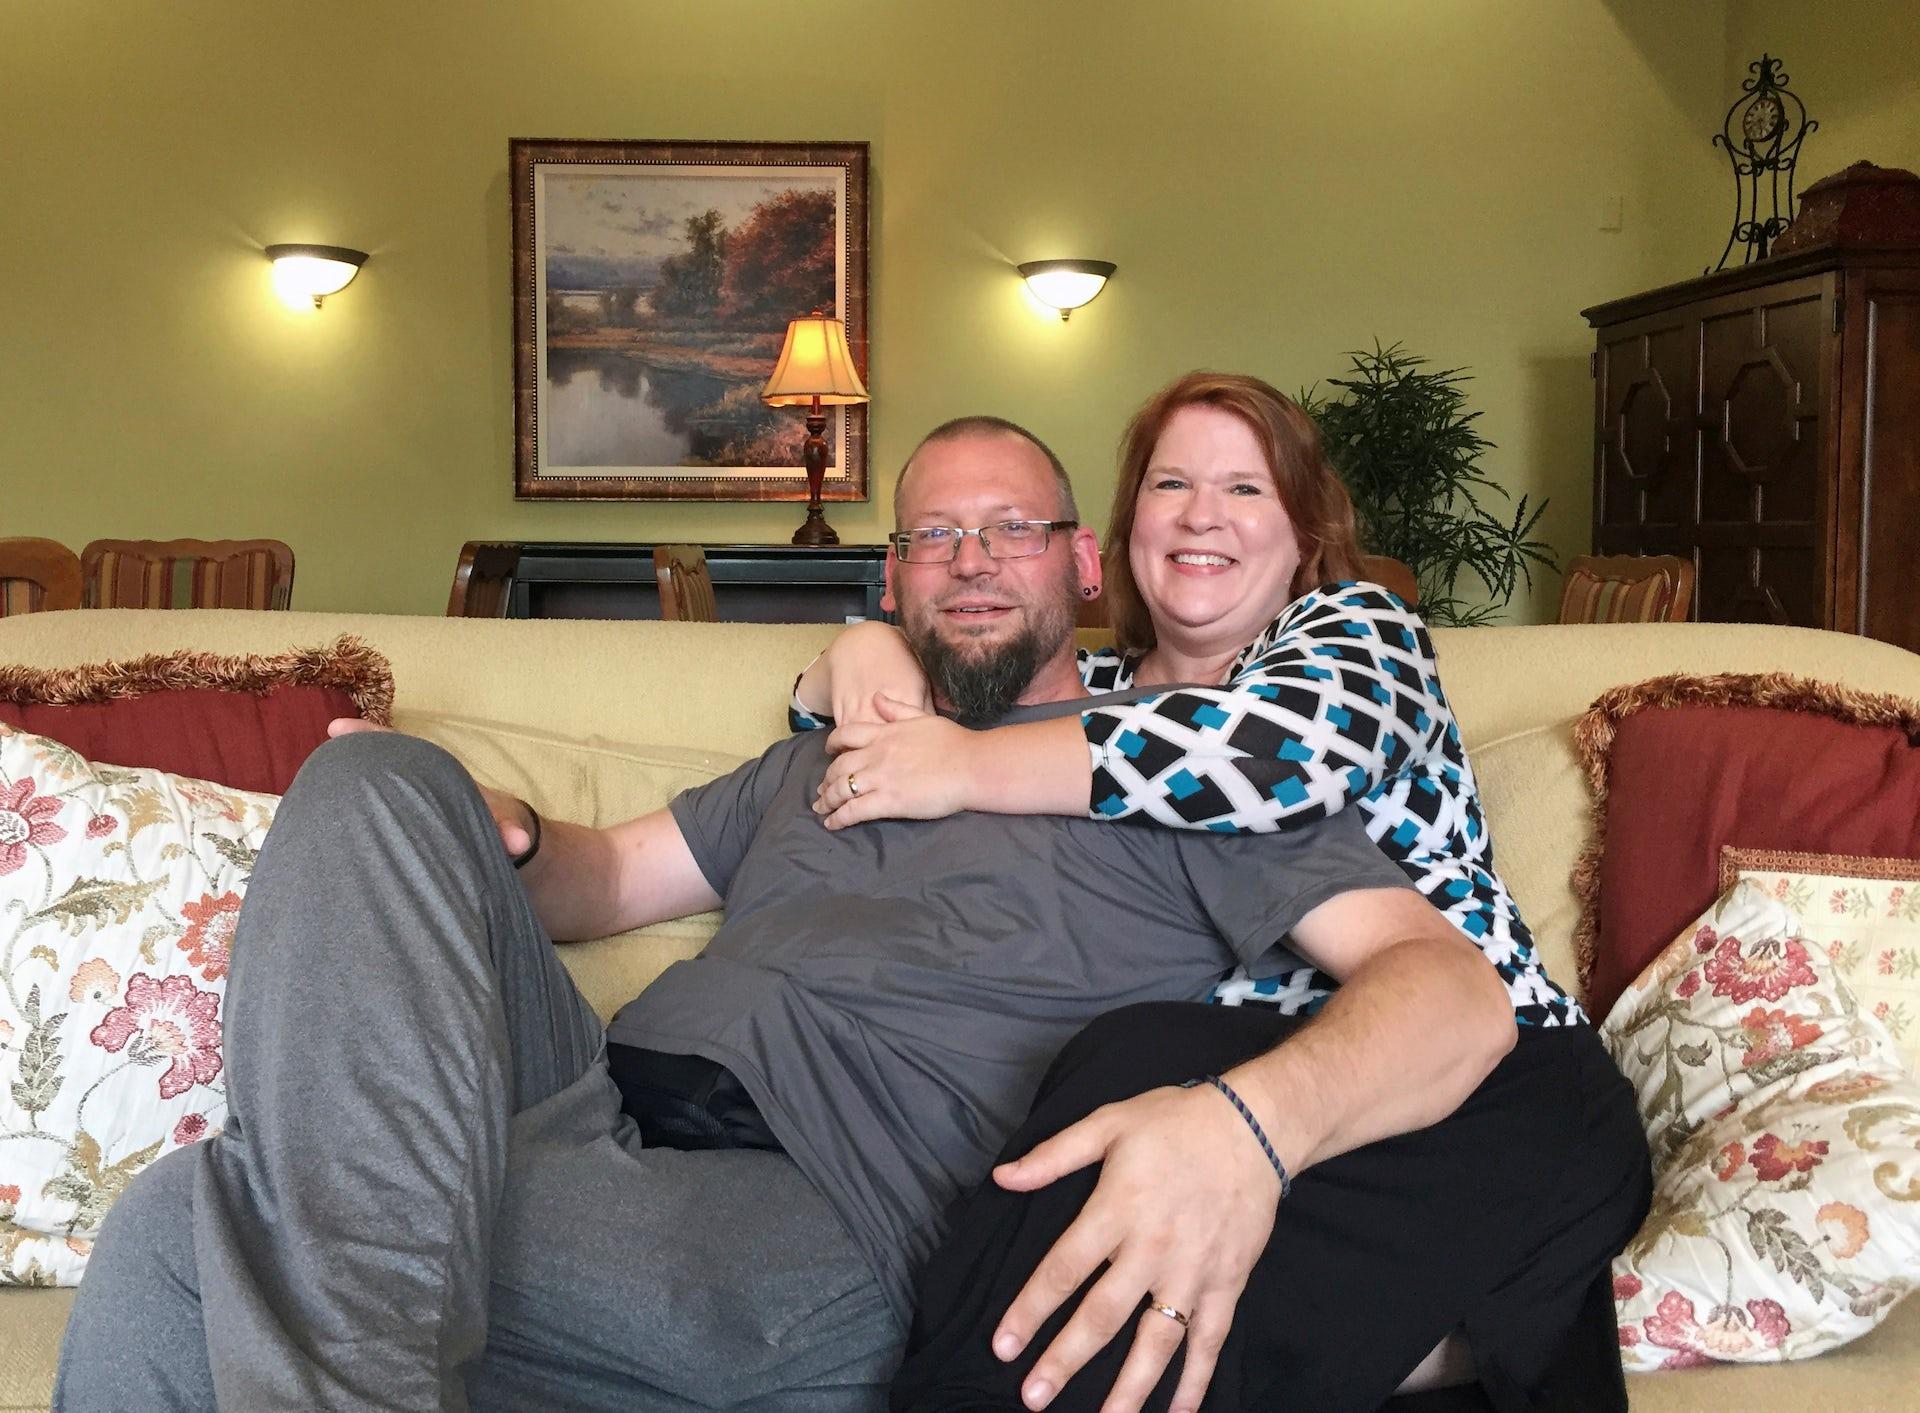 Interview s vampirom online dating